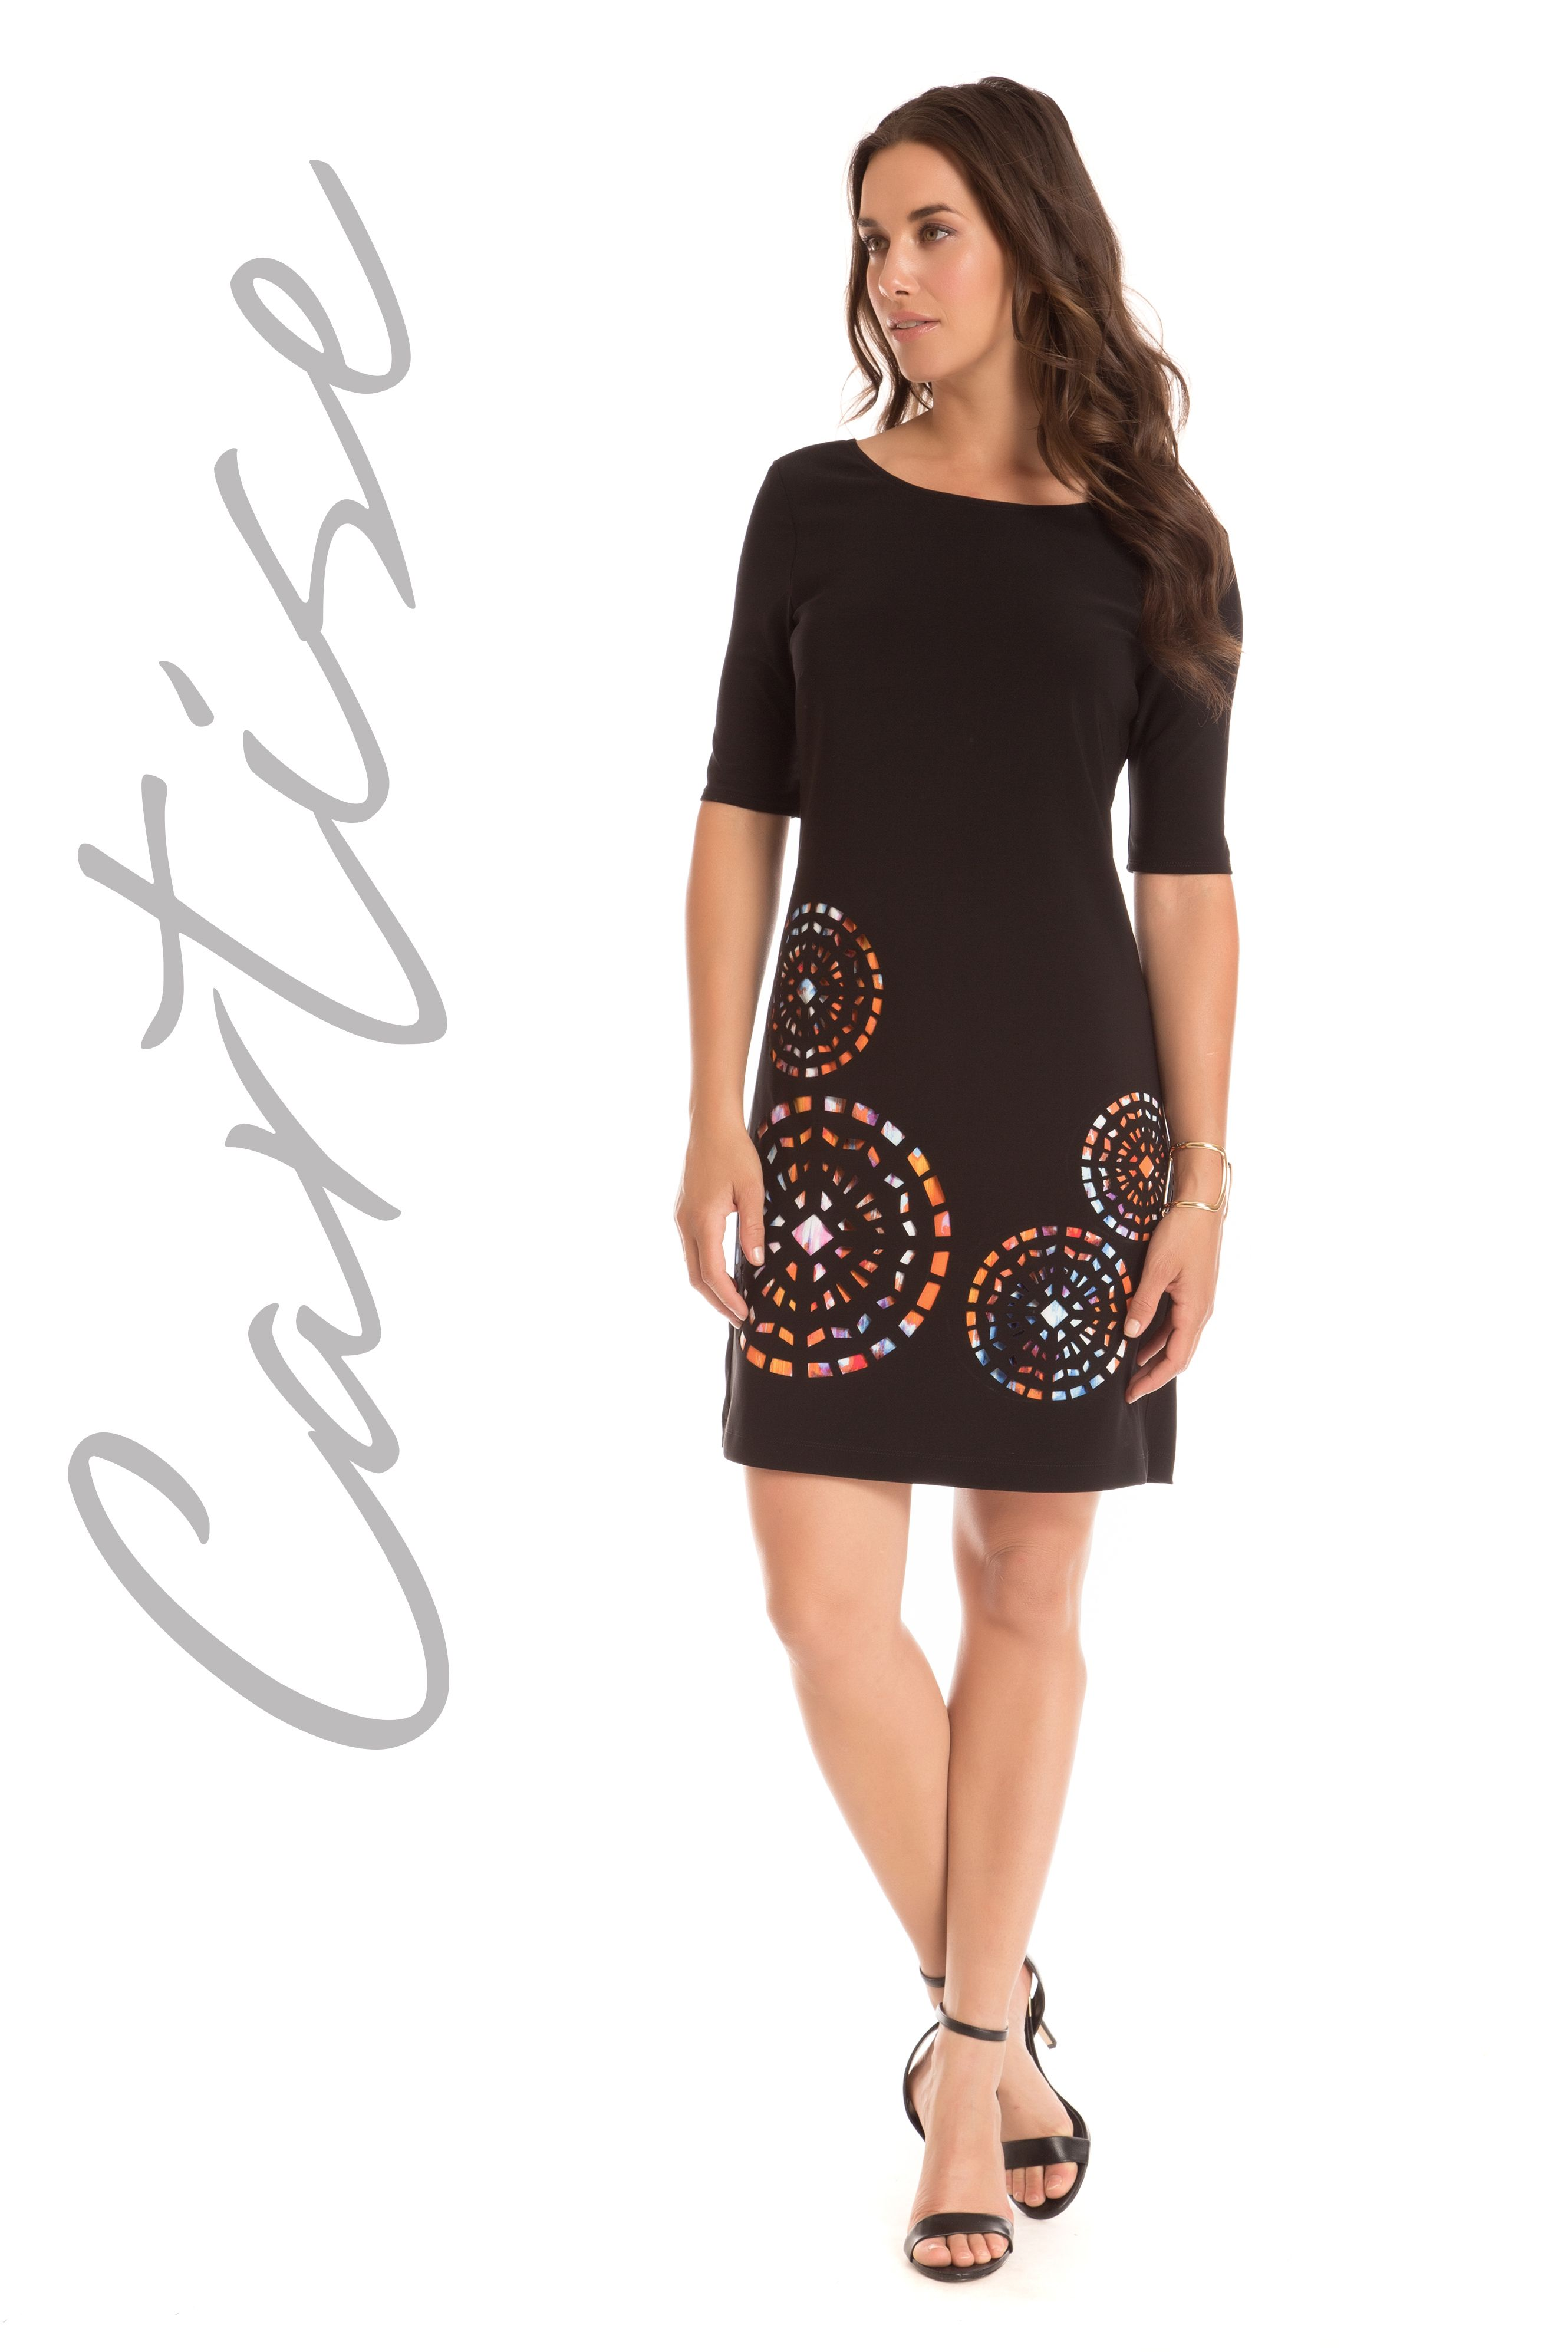 Laser cut dress by Cartise - mirellas.ca